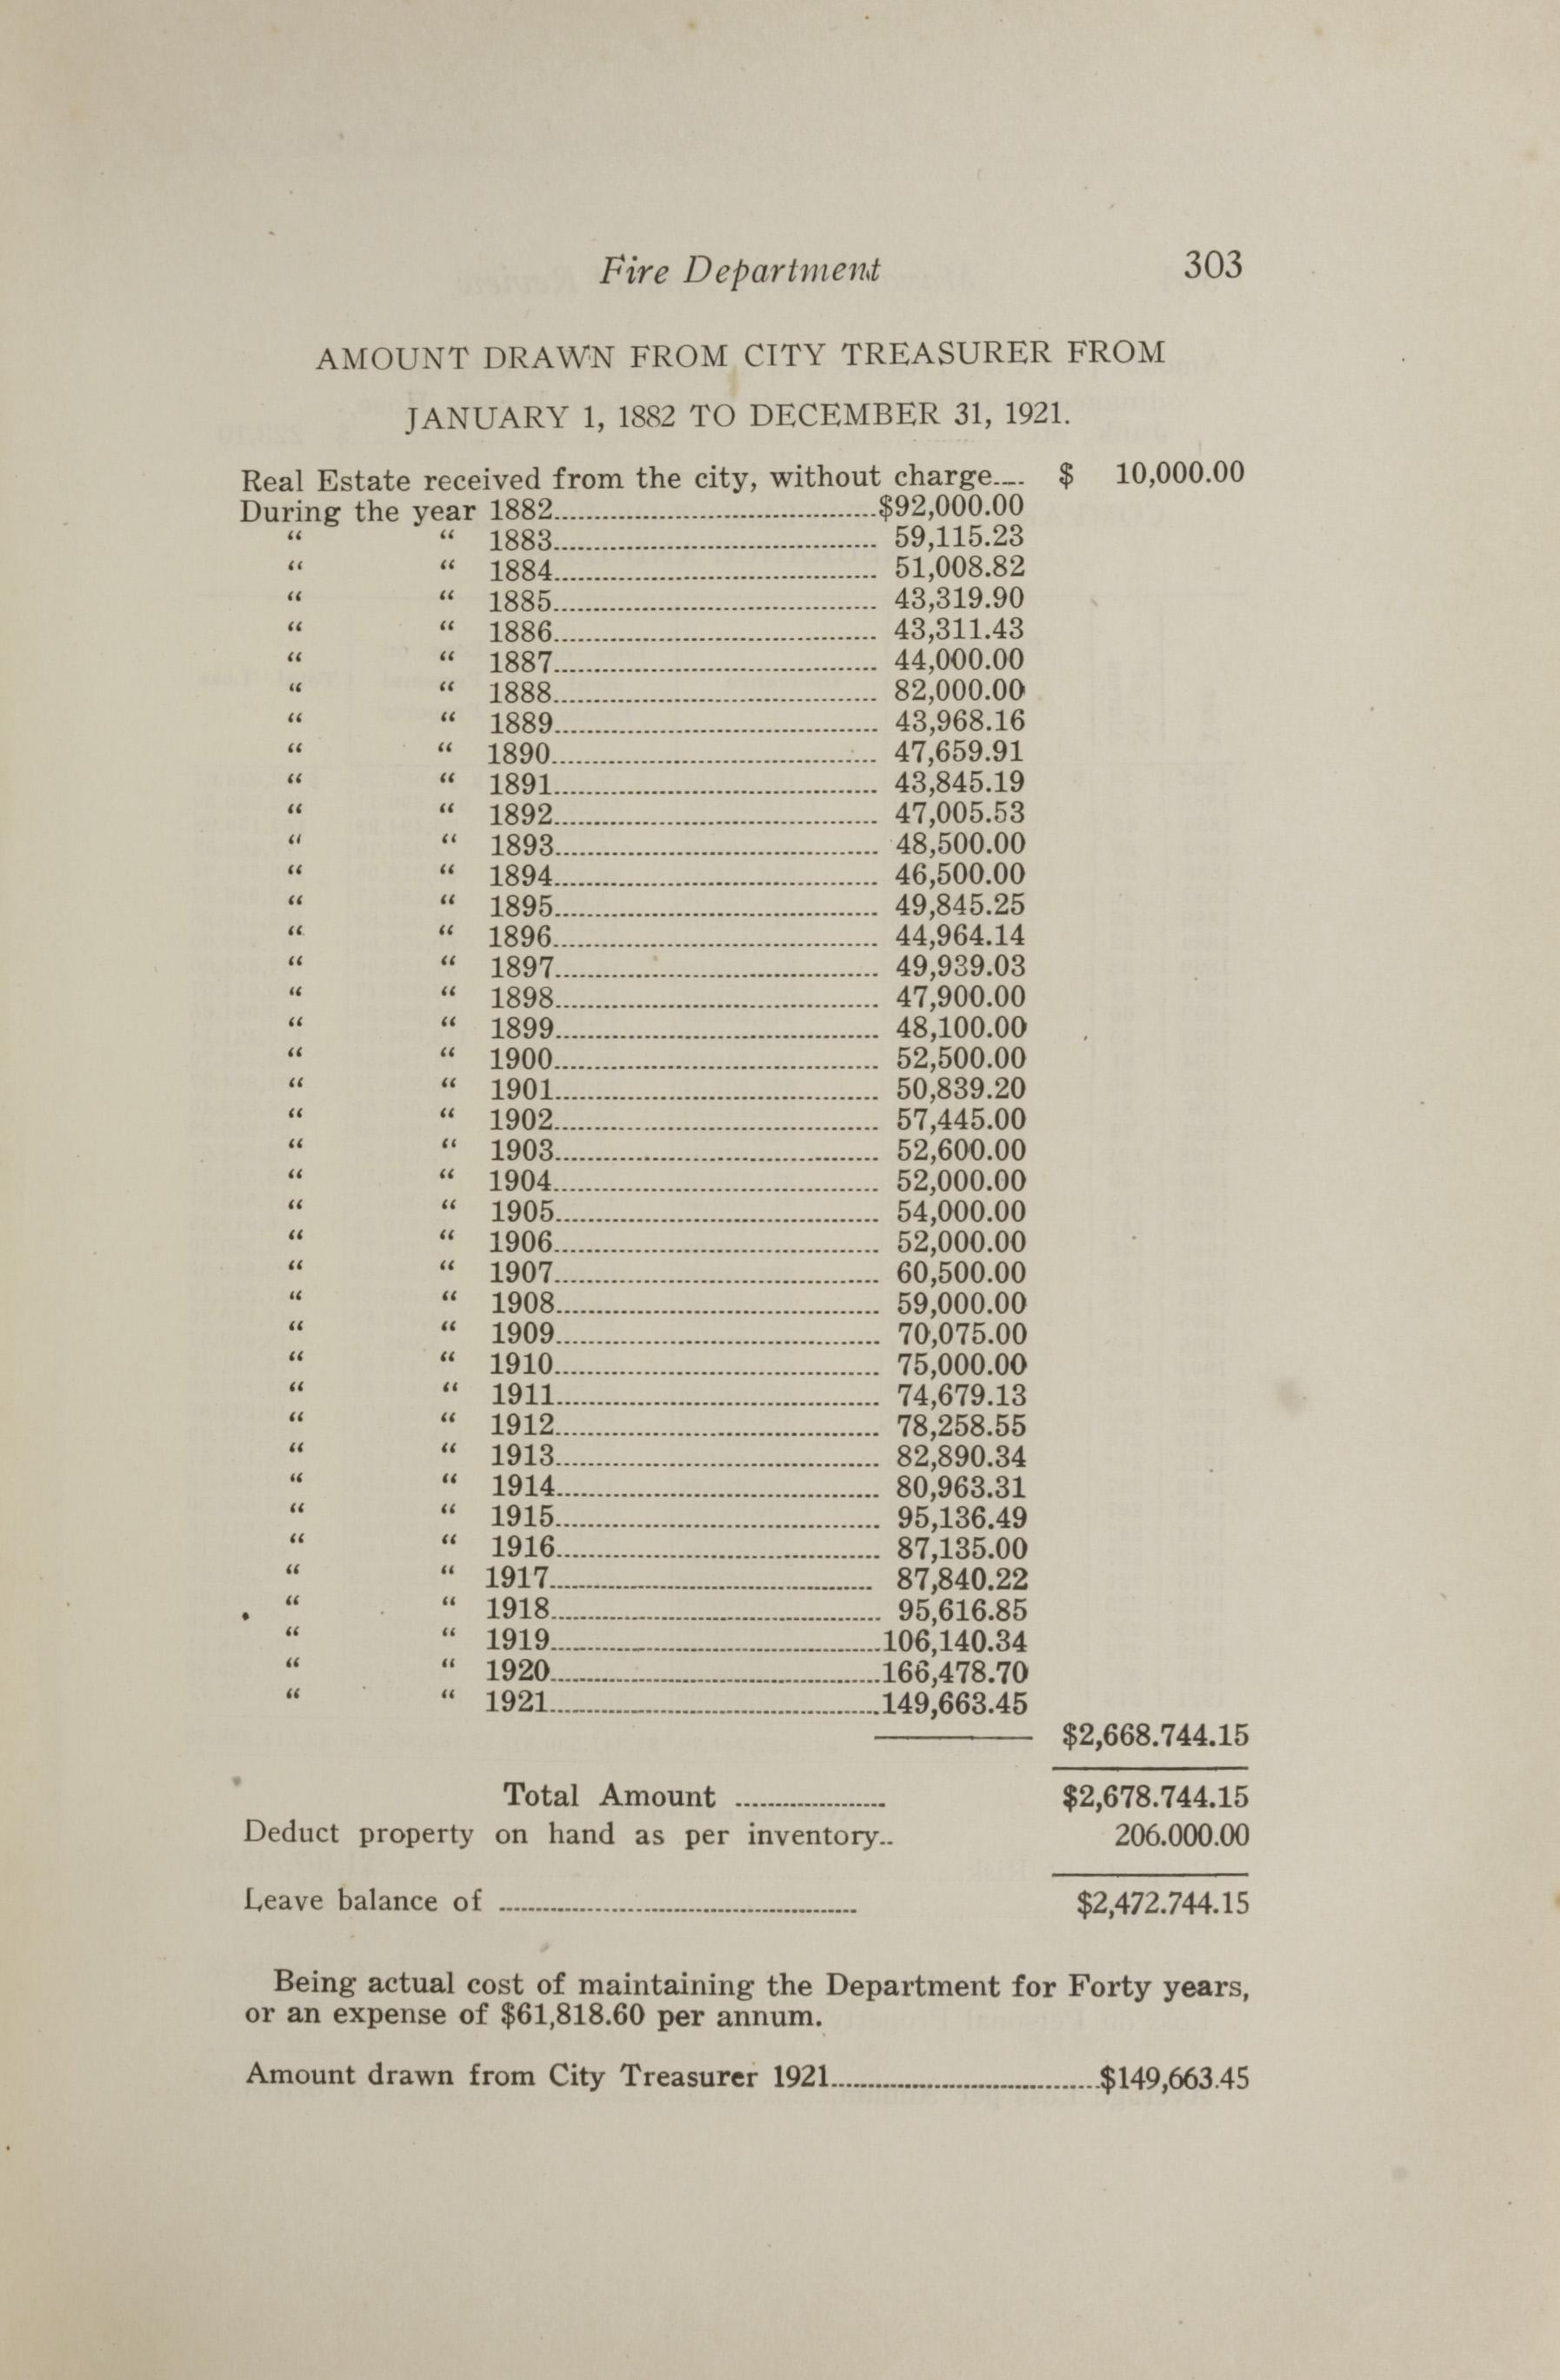 Charleston Yearbook, 1921, page 303